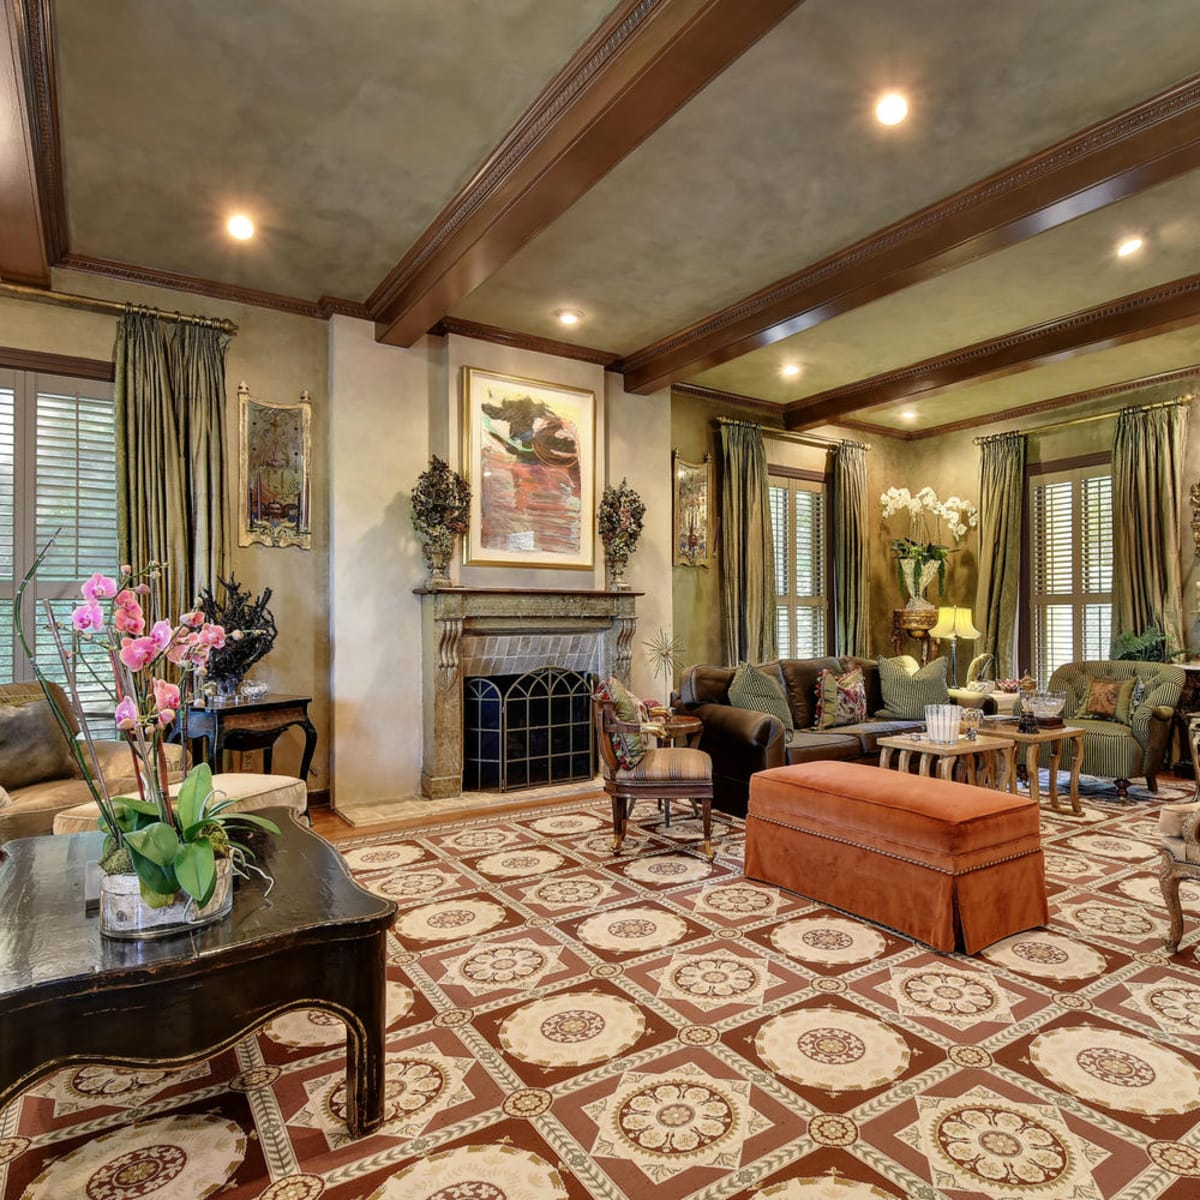 Austin house home Tarrytown 2610 Kenmore Court Ben Crenshaw February 2016 formal sitting